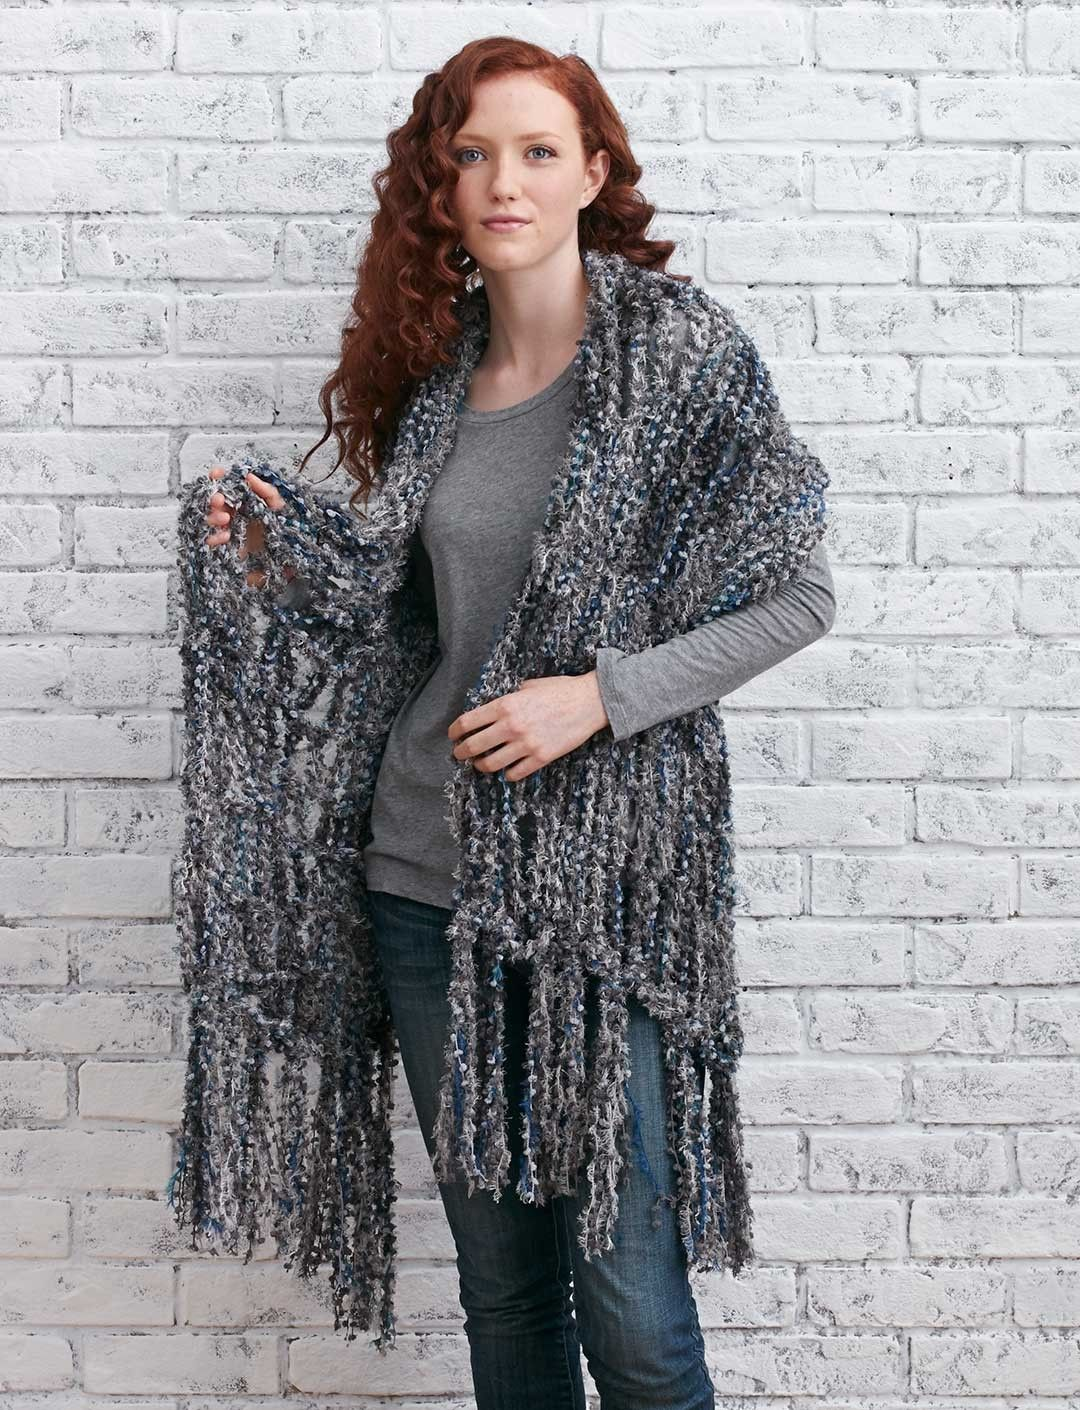 Arm Knit Fringed Wrap - Knitting Patterns - Patterns ...